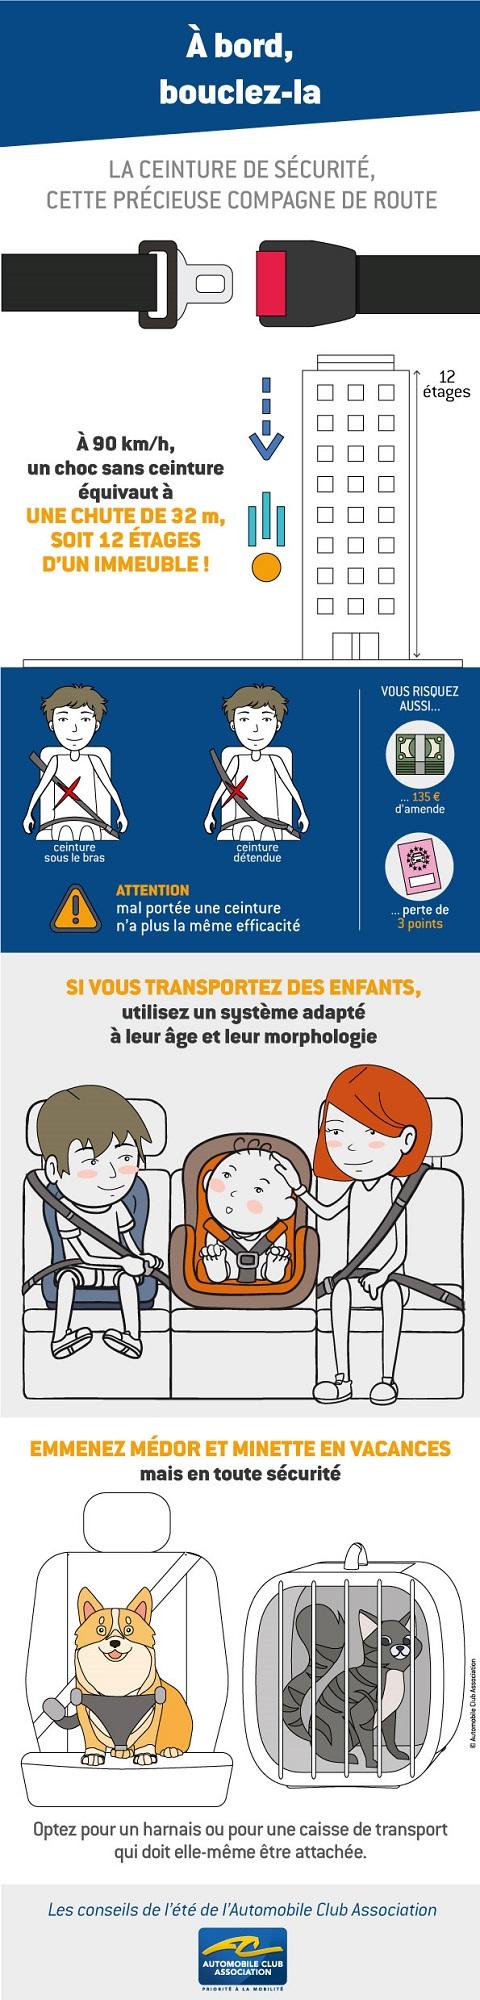 Conseil 5 ceinture sécurité